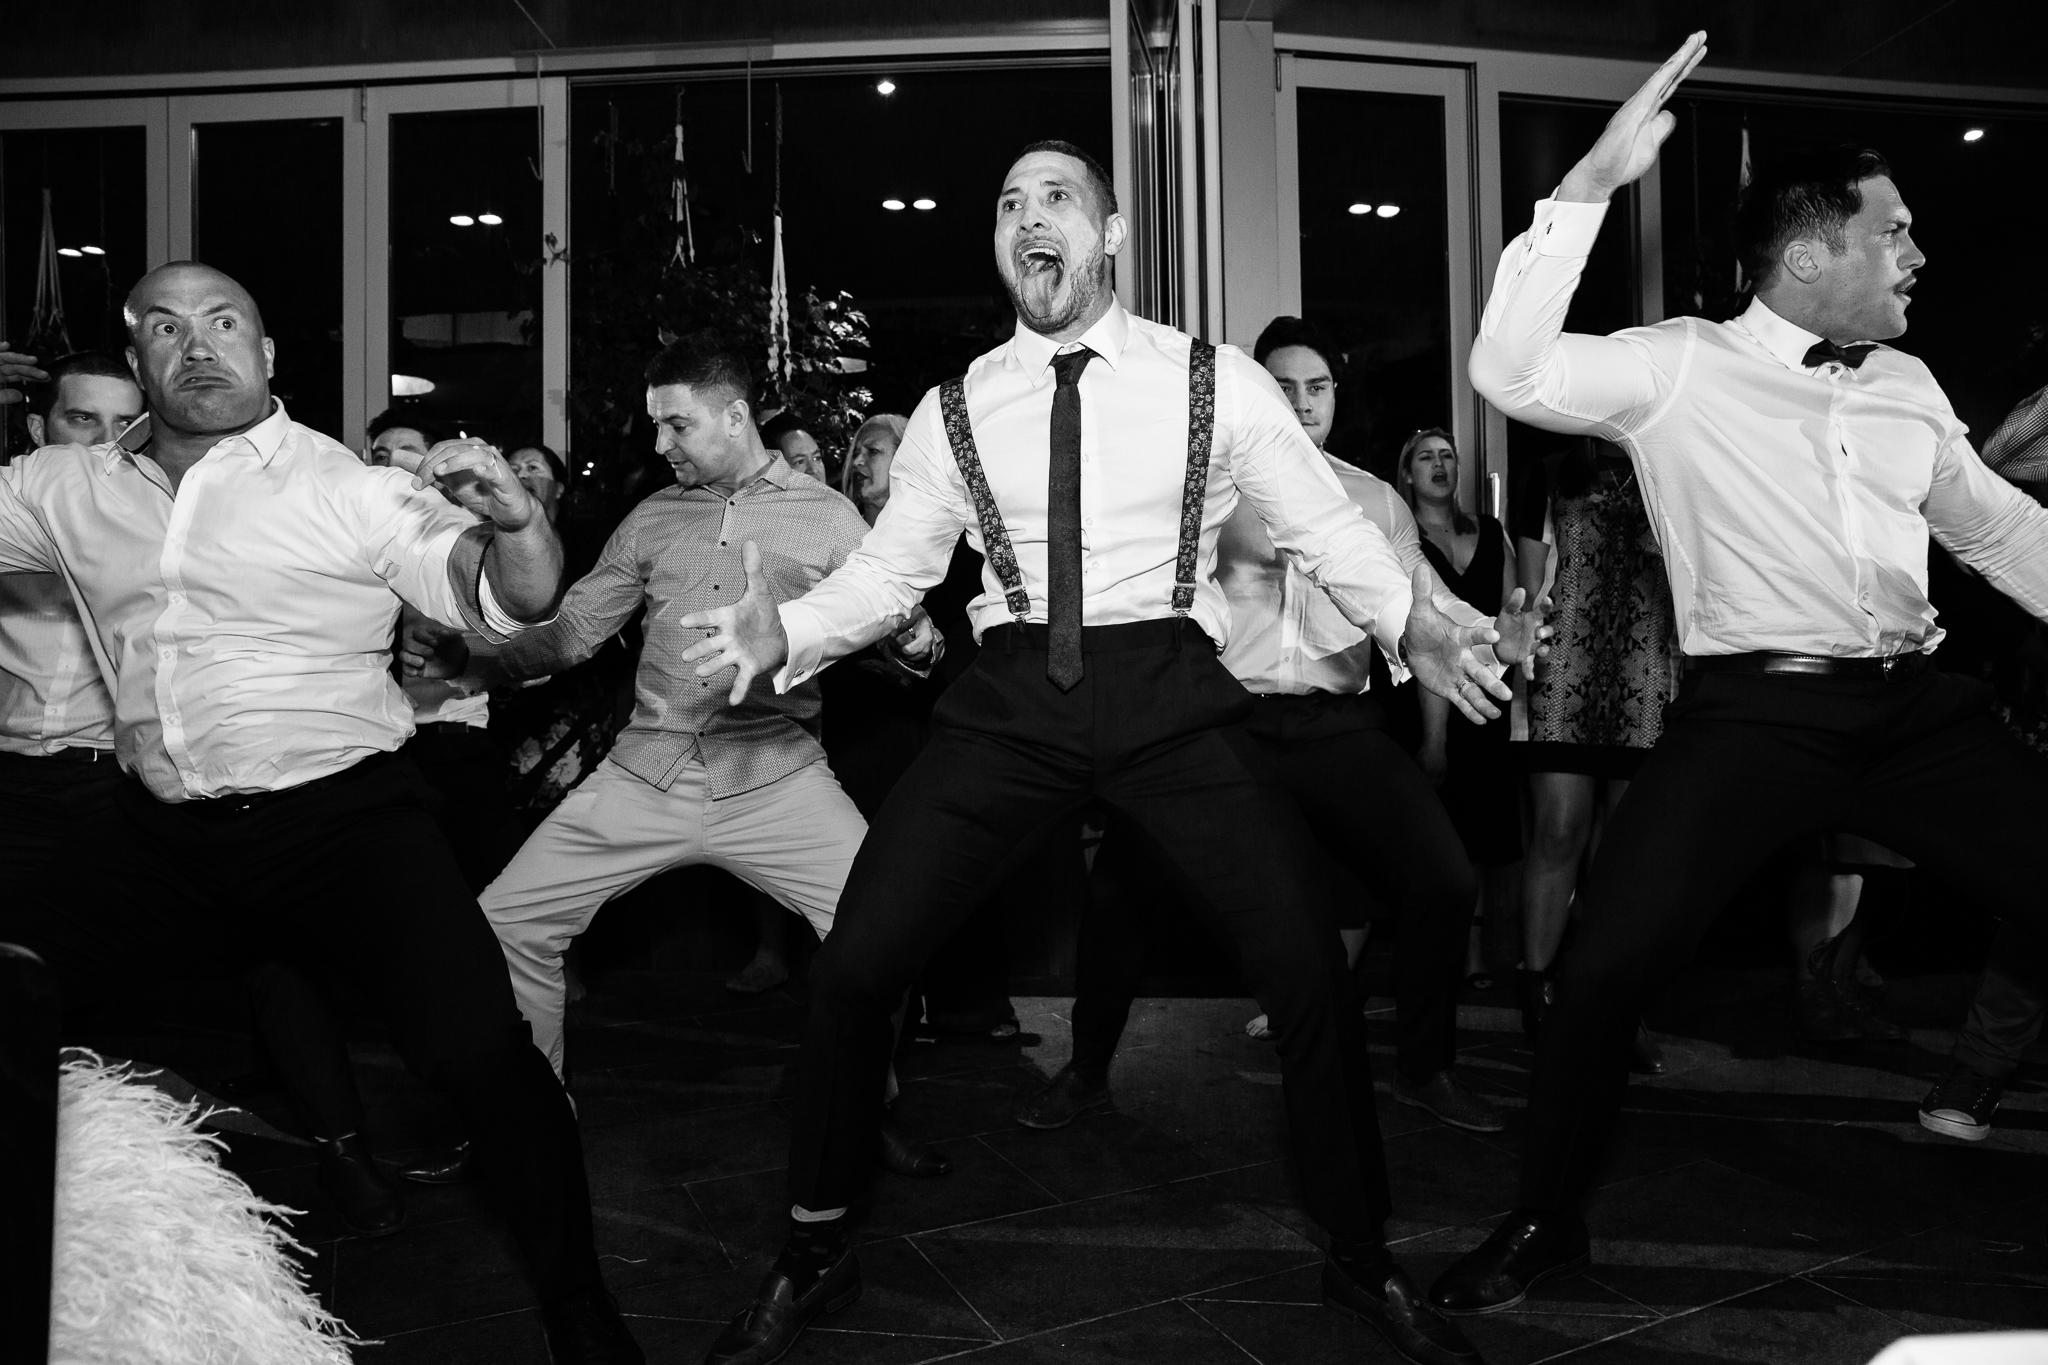 haka-dance-performance-wedding-reception-canberra